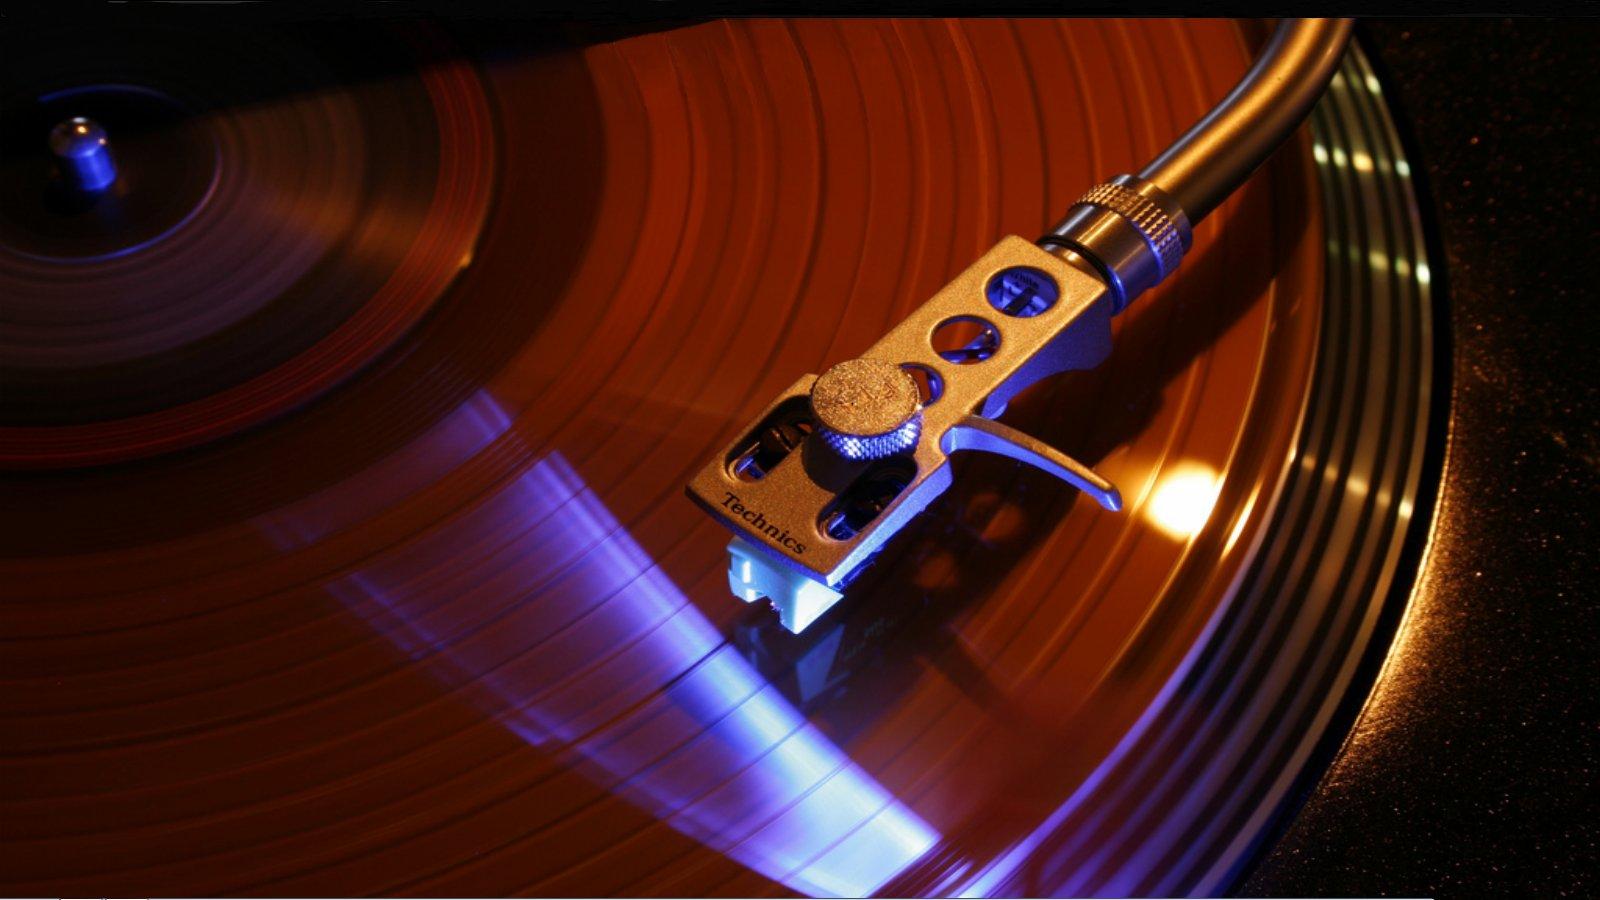 3d Vinyl Records Wallpaper Lista 8 Toca Discos Para Comprar E 1 Para Namorar